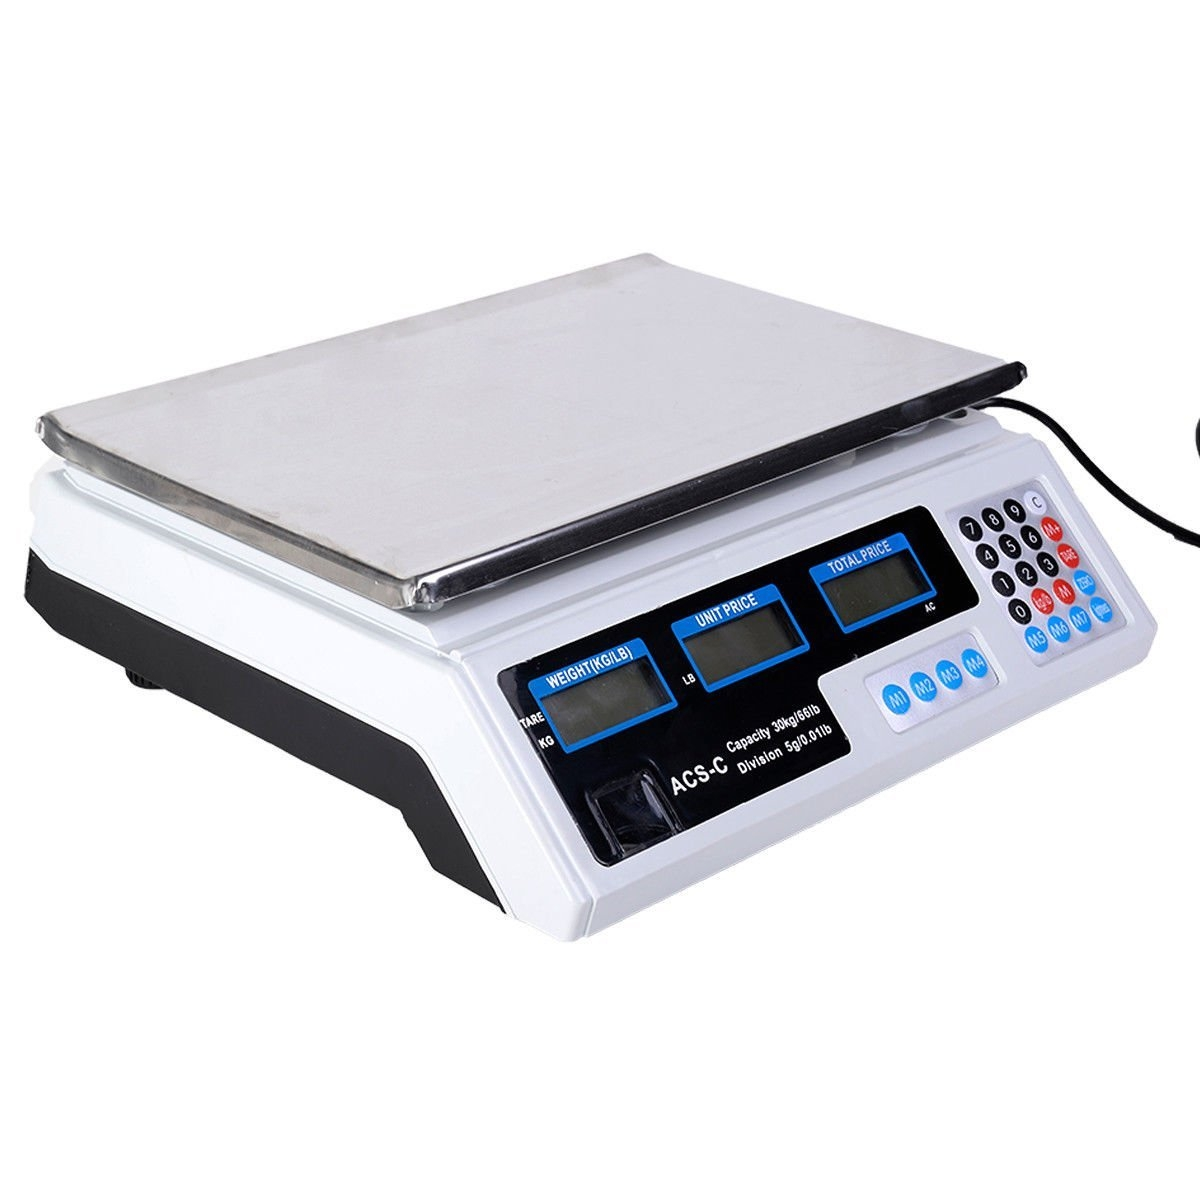 Super buy 66 LB Digital Scale Price Computing Deli Food P...